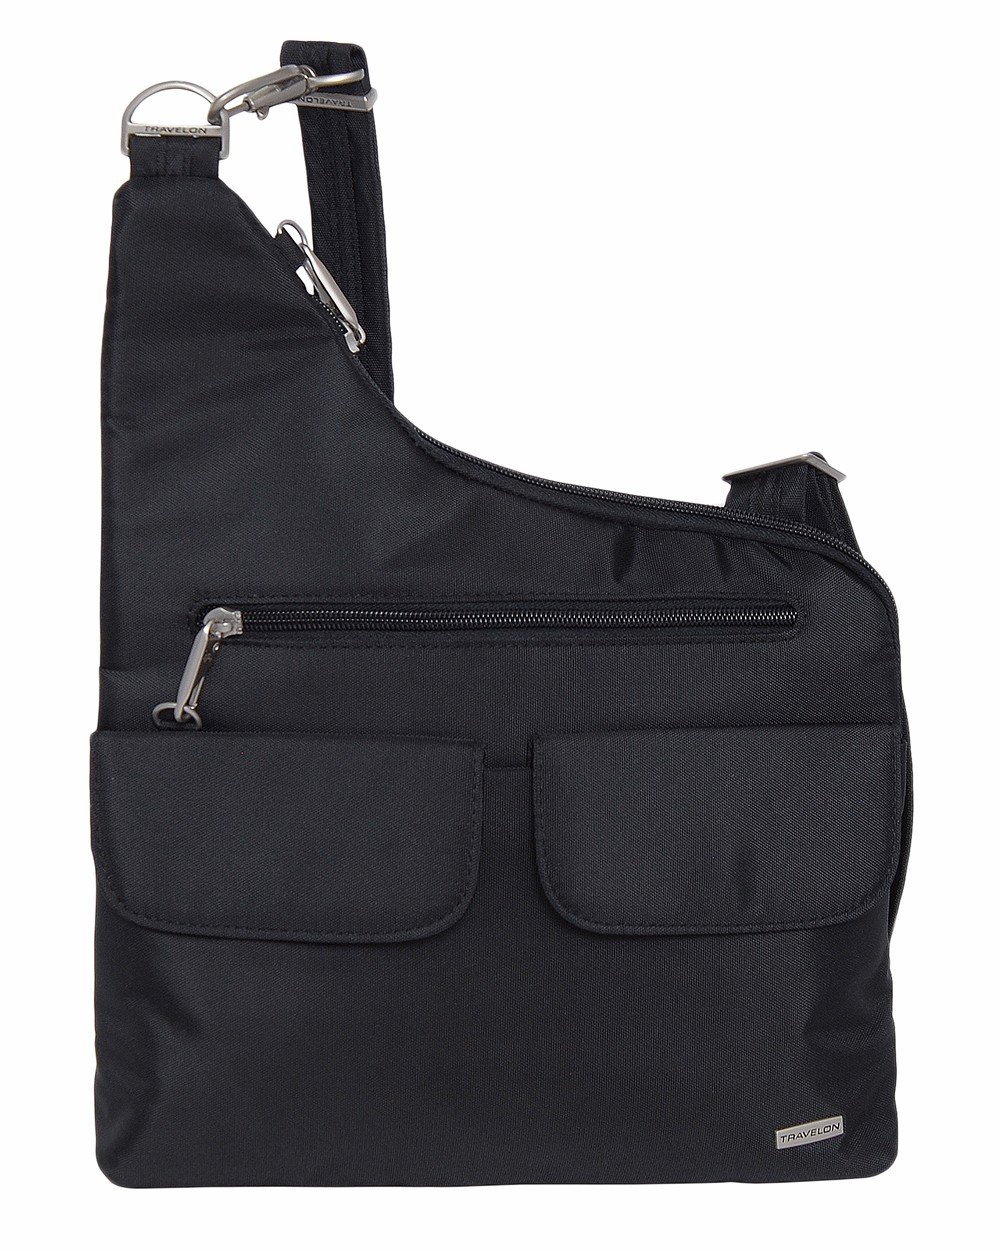 Travelon Anti-Theft Classic Crossbody Bucket Bag (One Size, Black w/Teal Lining)